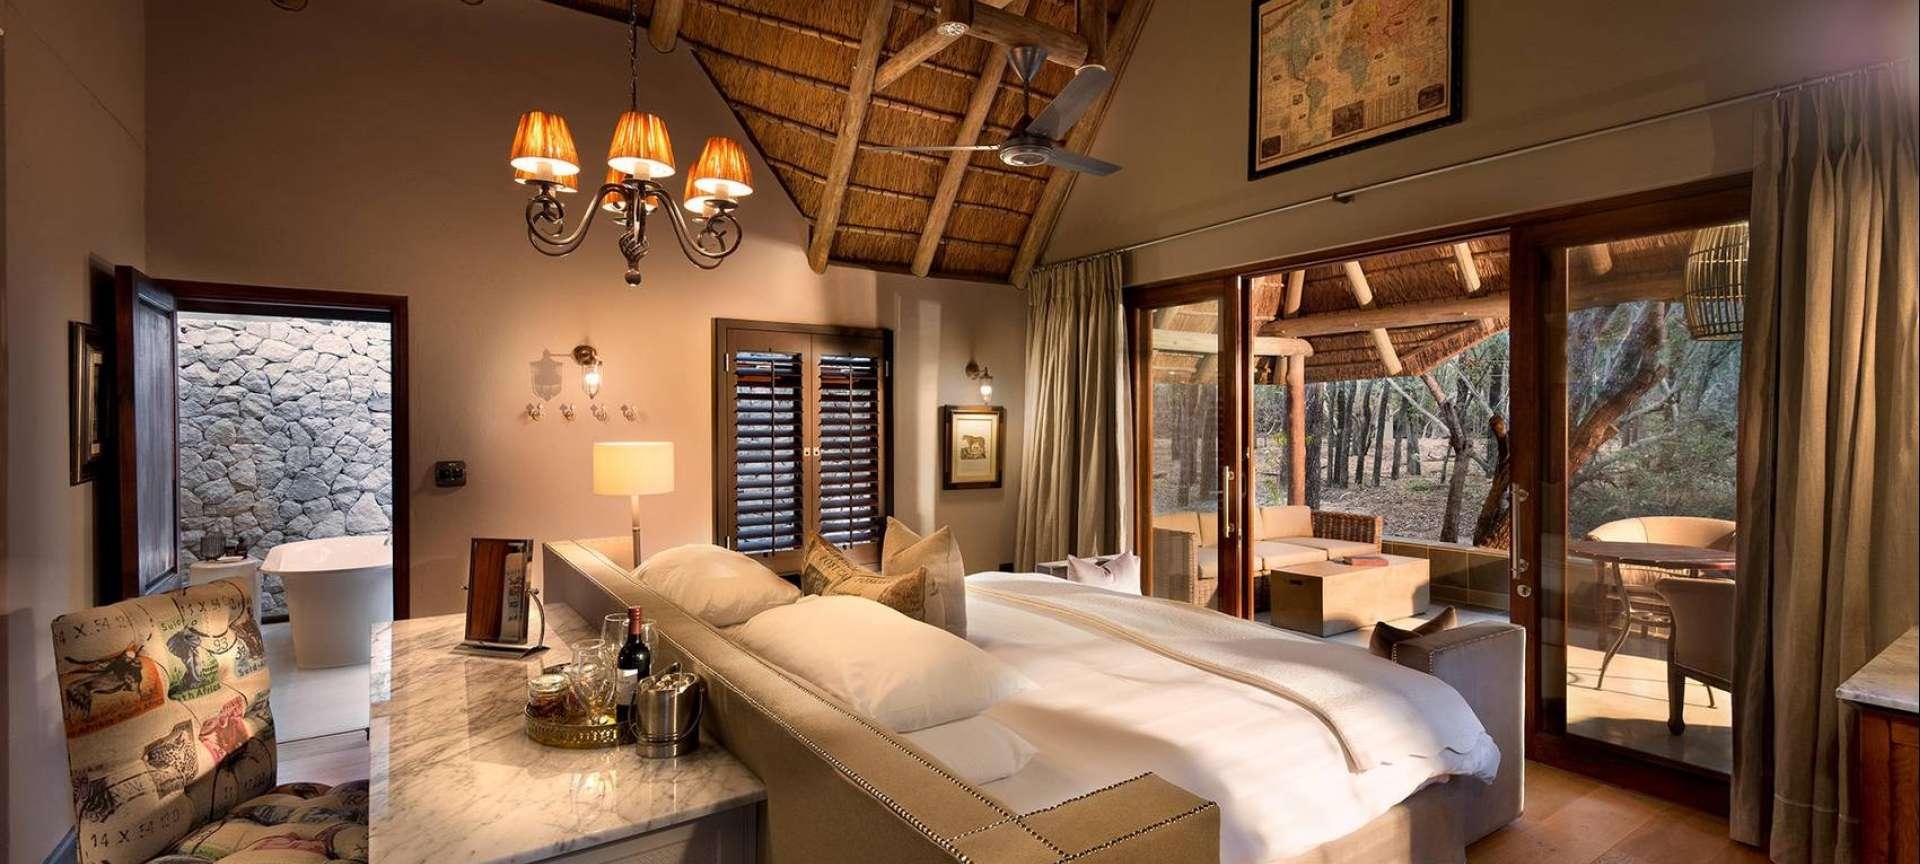 Luxury safari in the Kruger National Park - Africa Wildlife Safaris